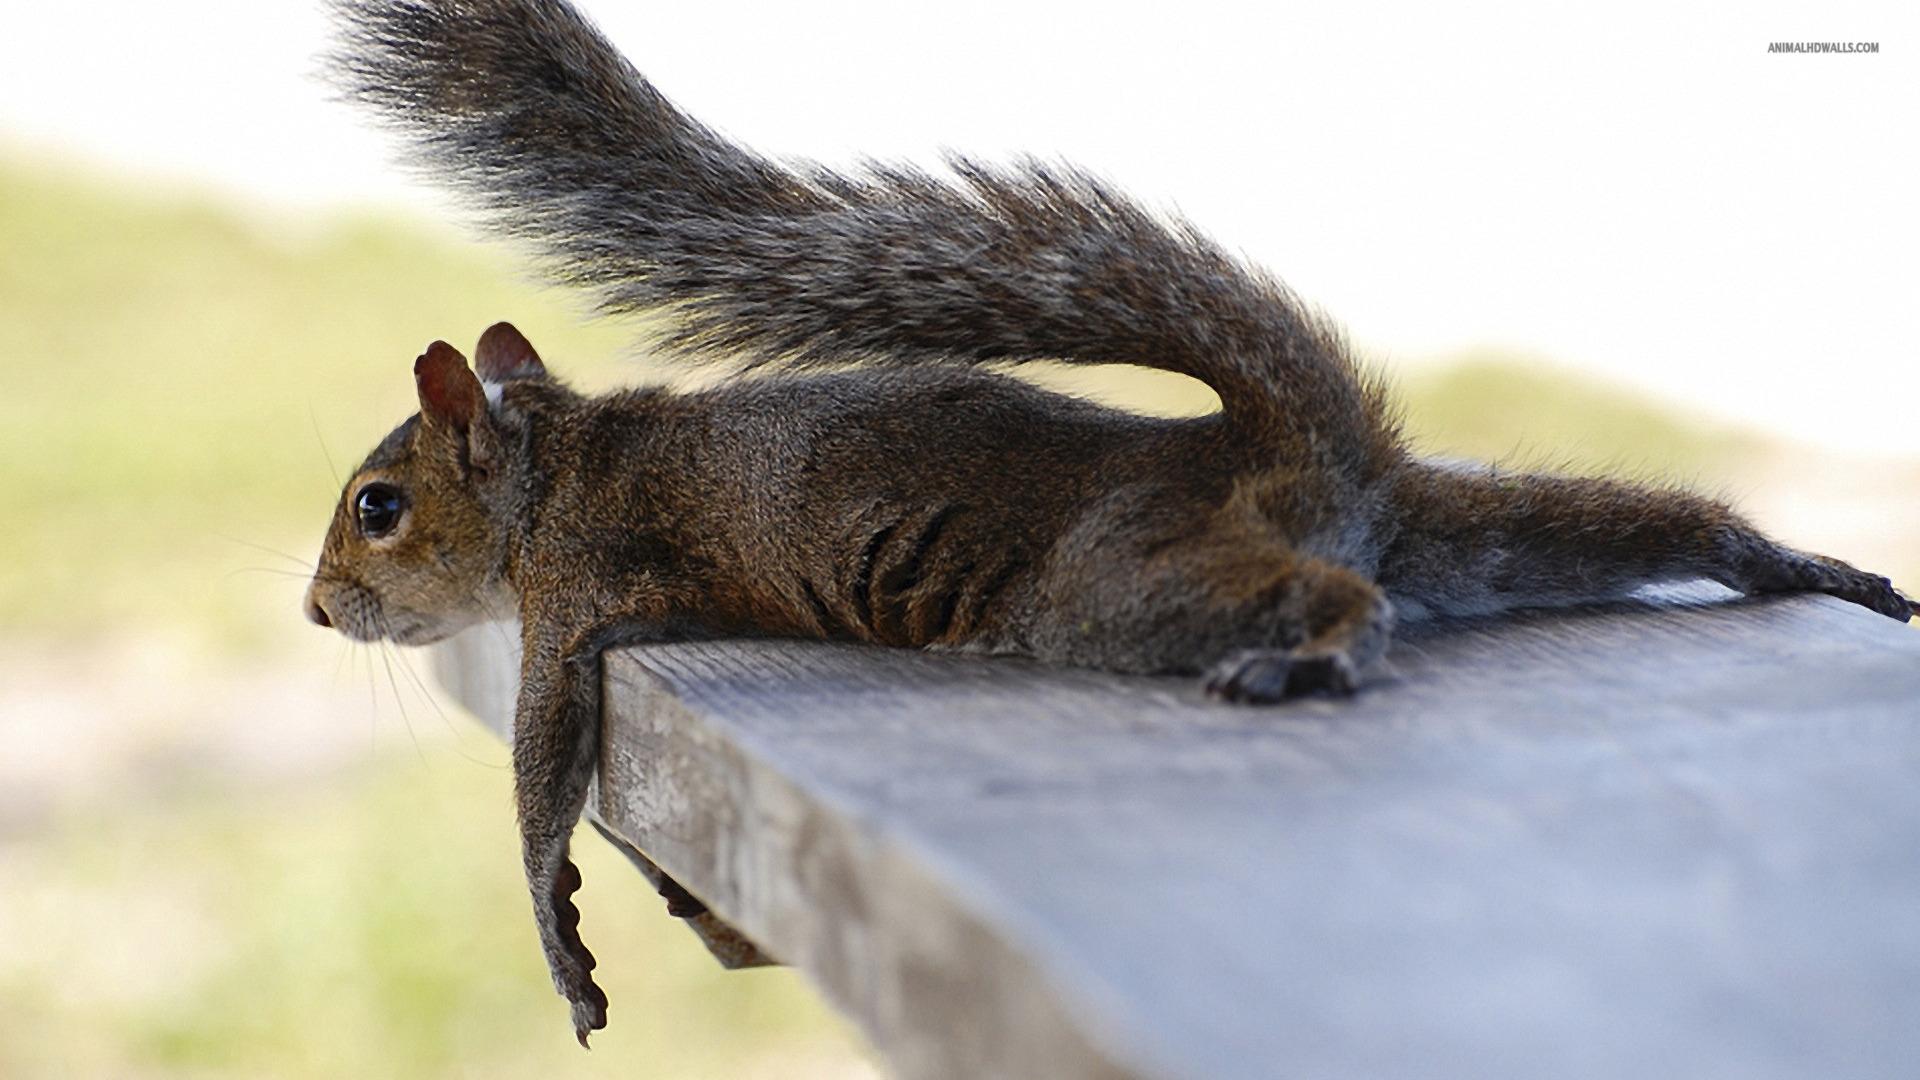 Squirrel wallpaper 1920x1080